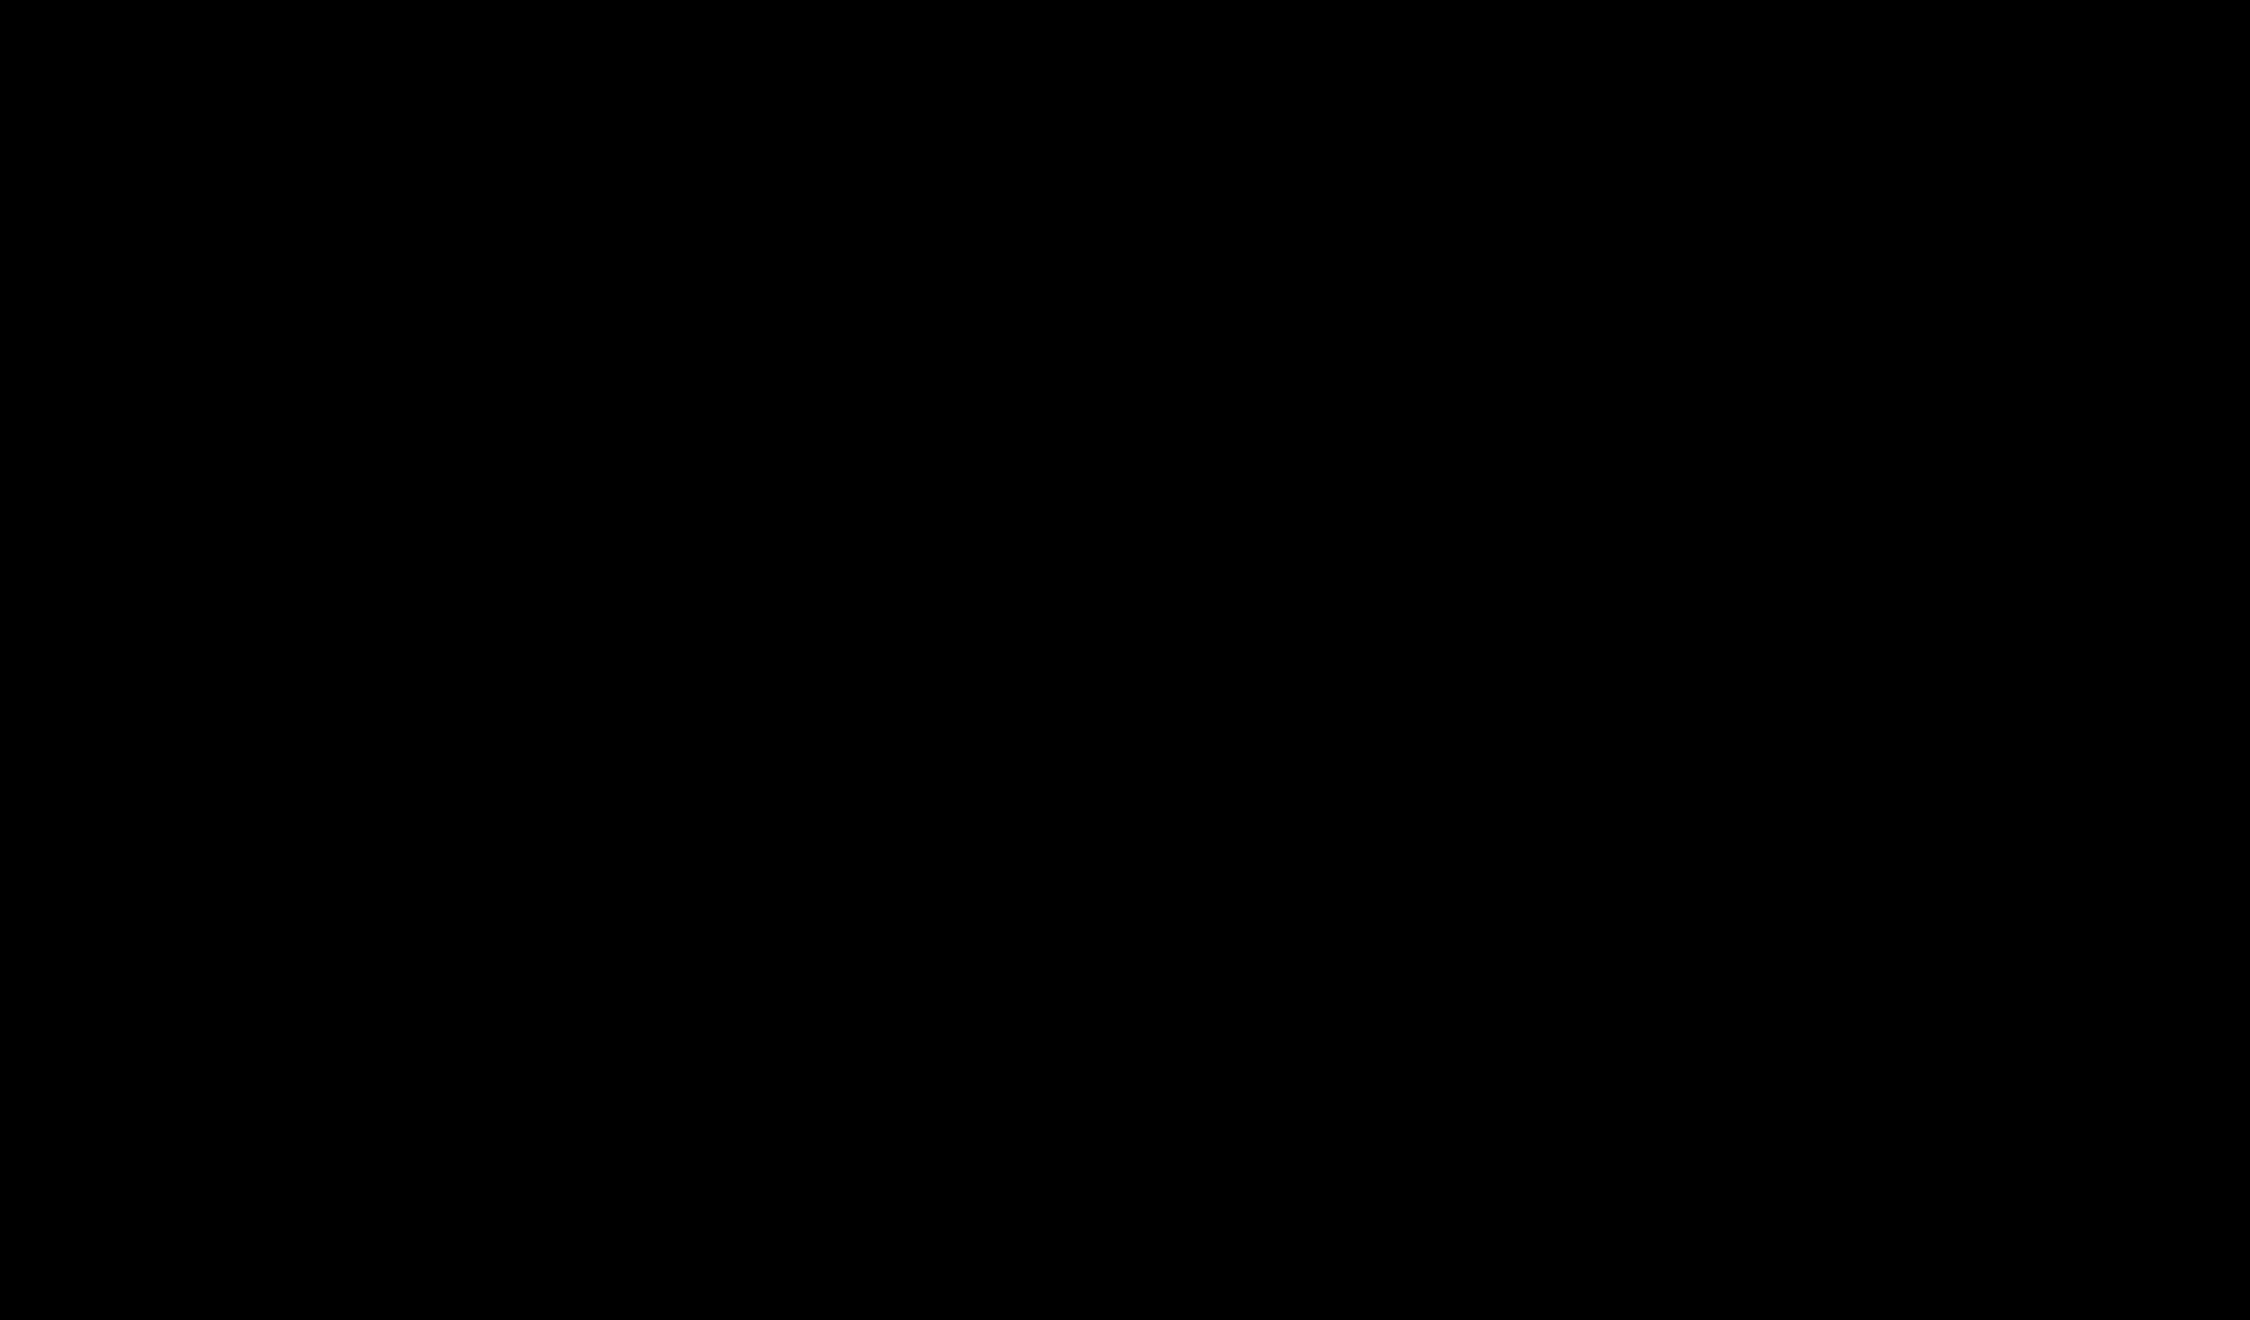 cnlogotag